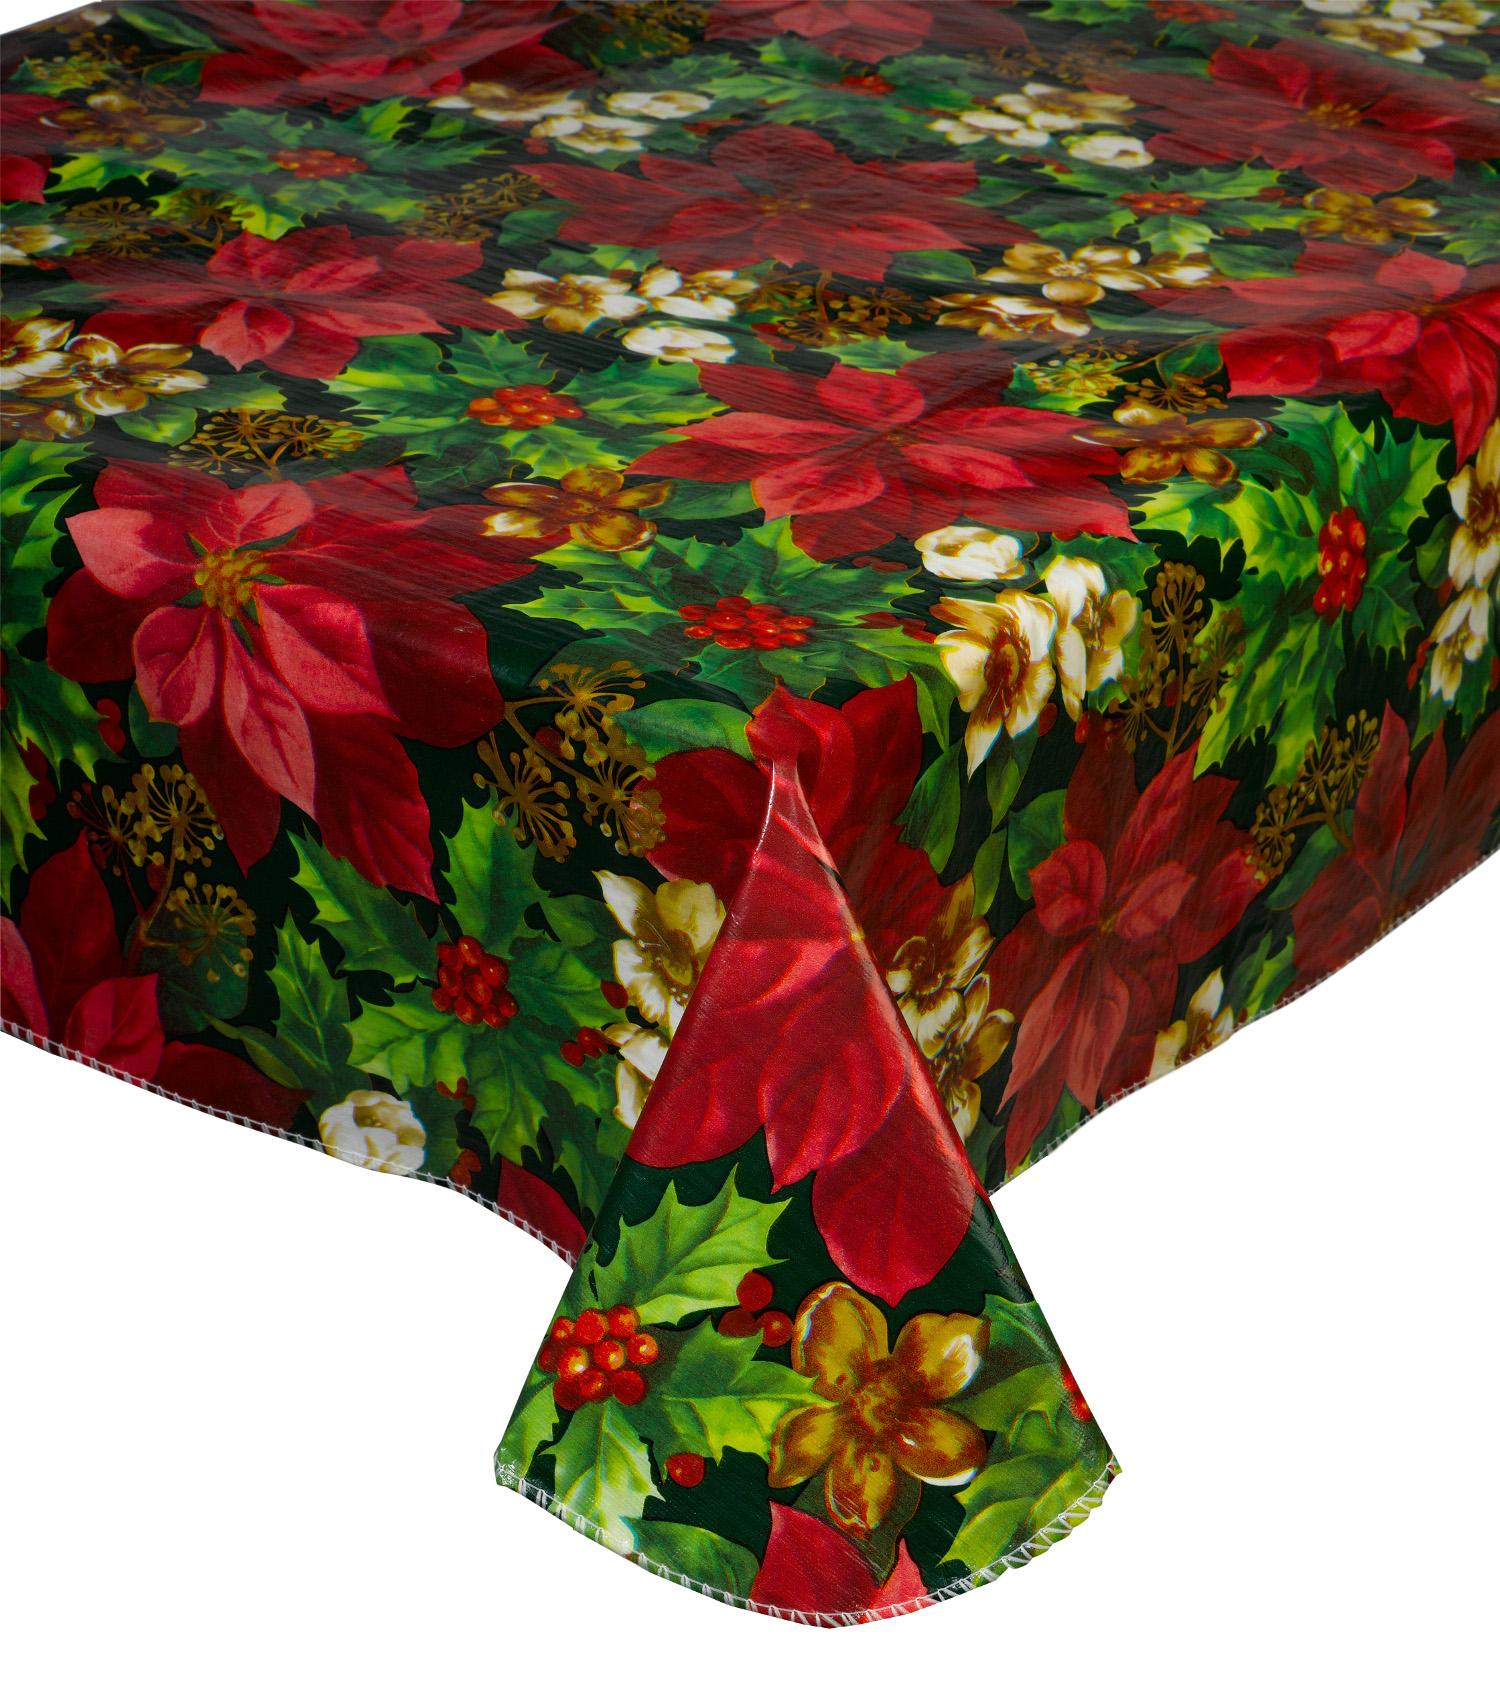 Christmas PVC Tablecloth Flannel Back Festive Xmas Dining  : red poinsettia pvc tablecloth christmas xmas festive tablecloth table linen from www.ebay.co.uk size 1500 x 1700 jpeg 811kB